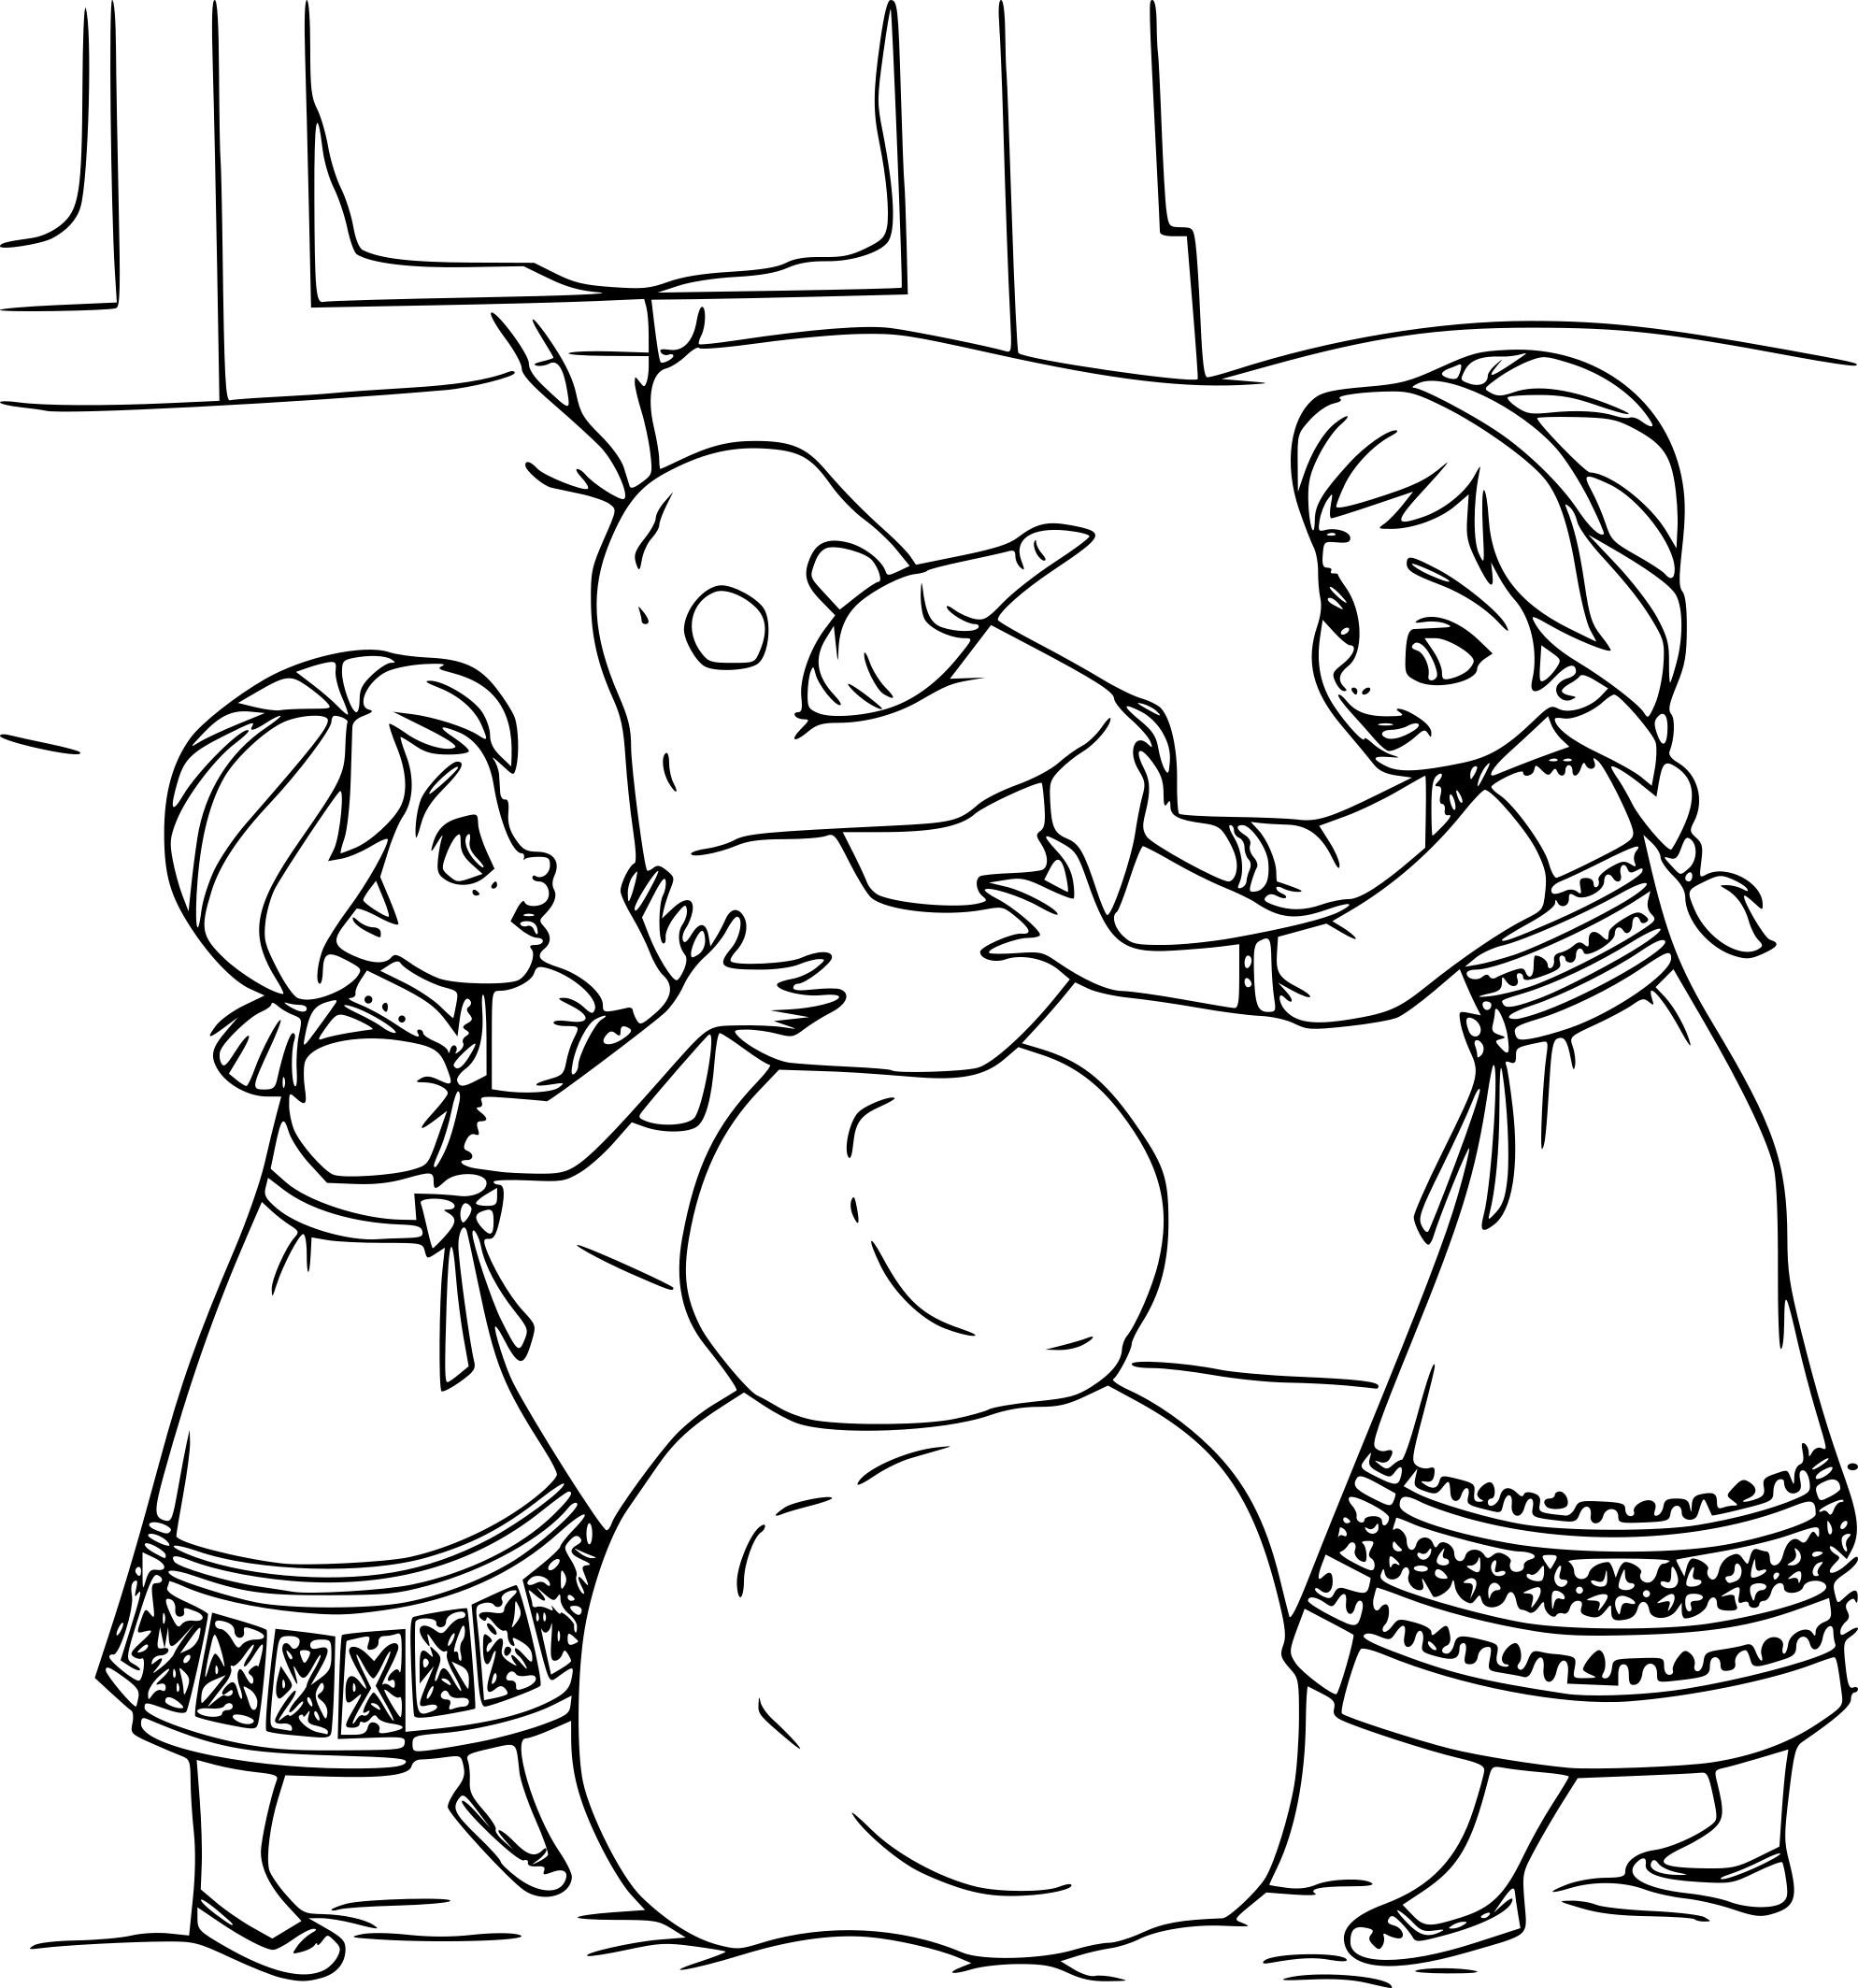 Coloriage princesse elsa dessin gratuit imprimer elsa coloriage - Coloriage elsa ...